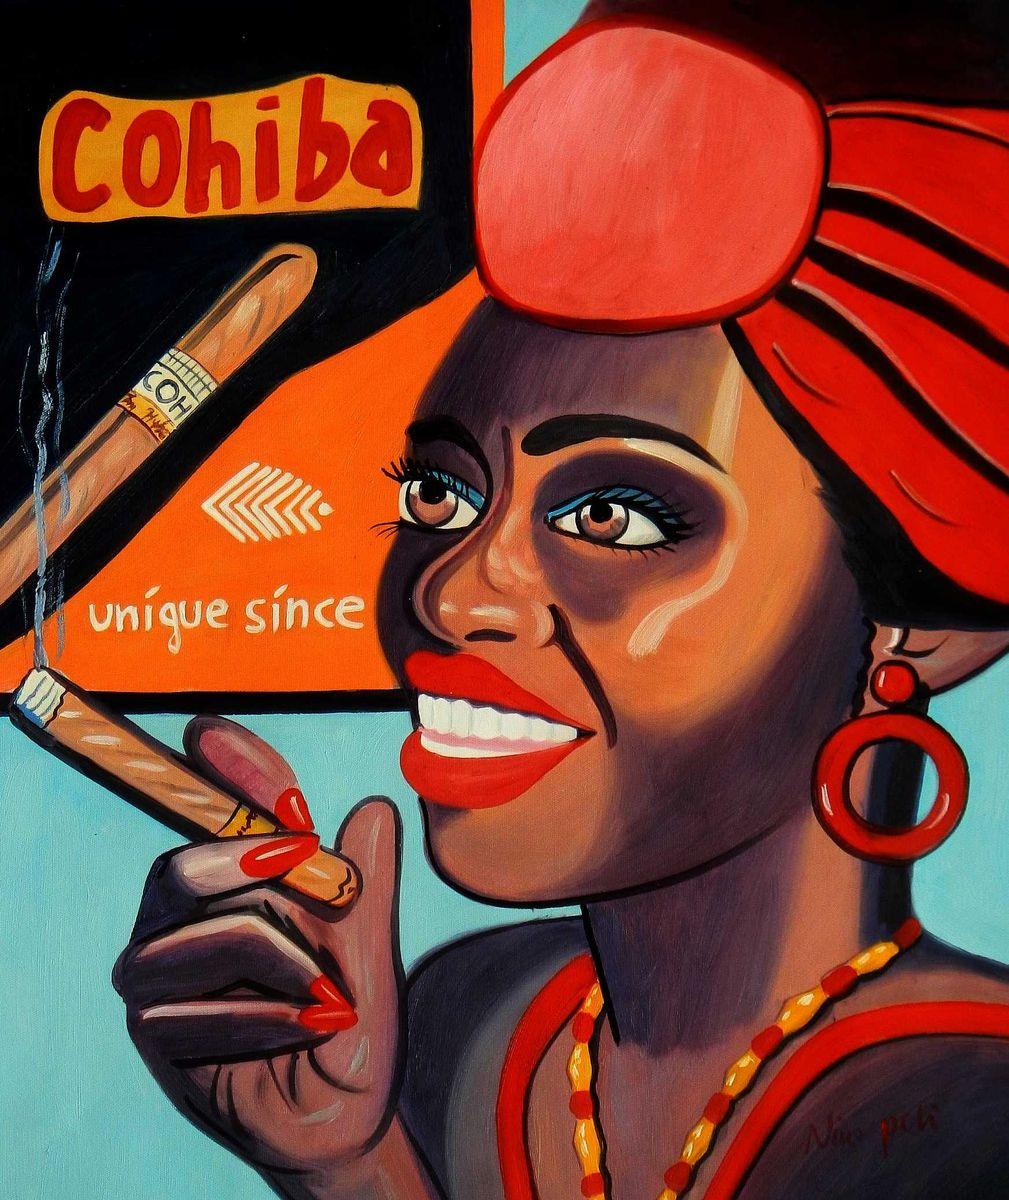 Modern Art - Frau mit Cohiba Zigarre c95756 50x60cm exquisites Ölgemälde